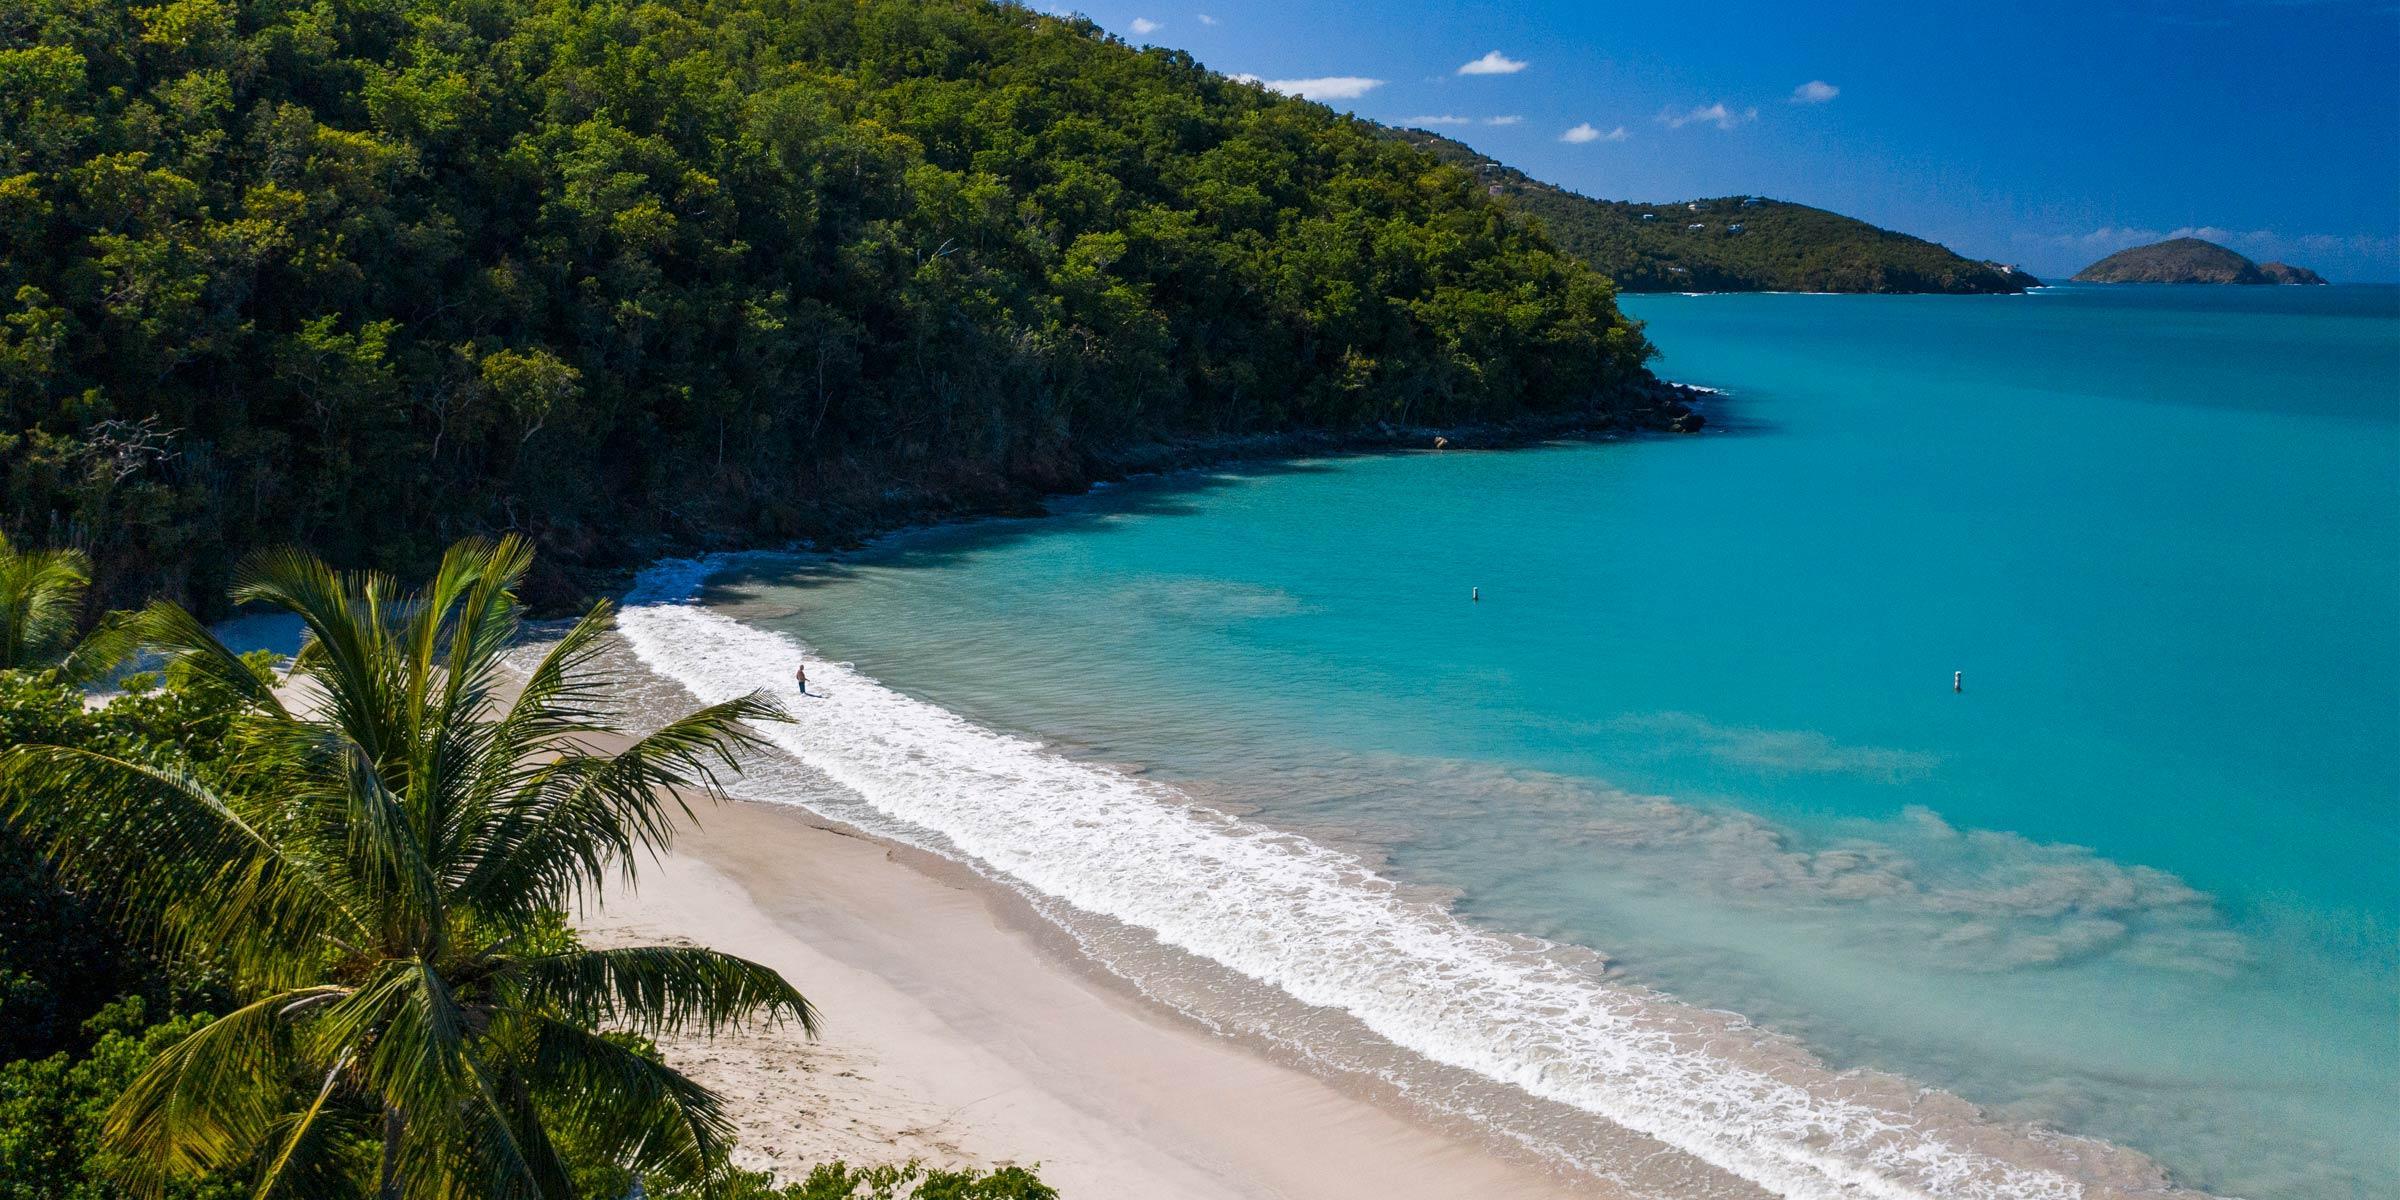 Magen's Bay Beach on St. Thomas, U.S. Virgin Islands